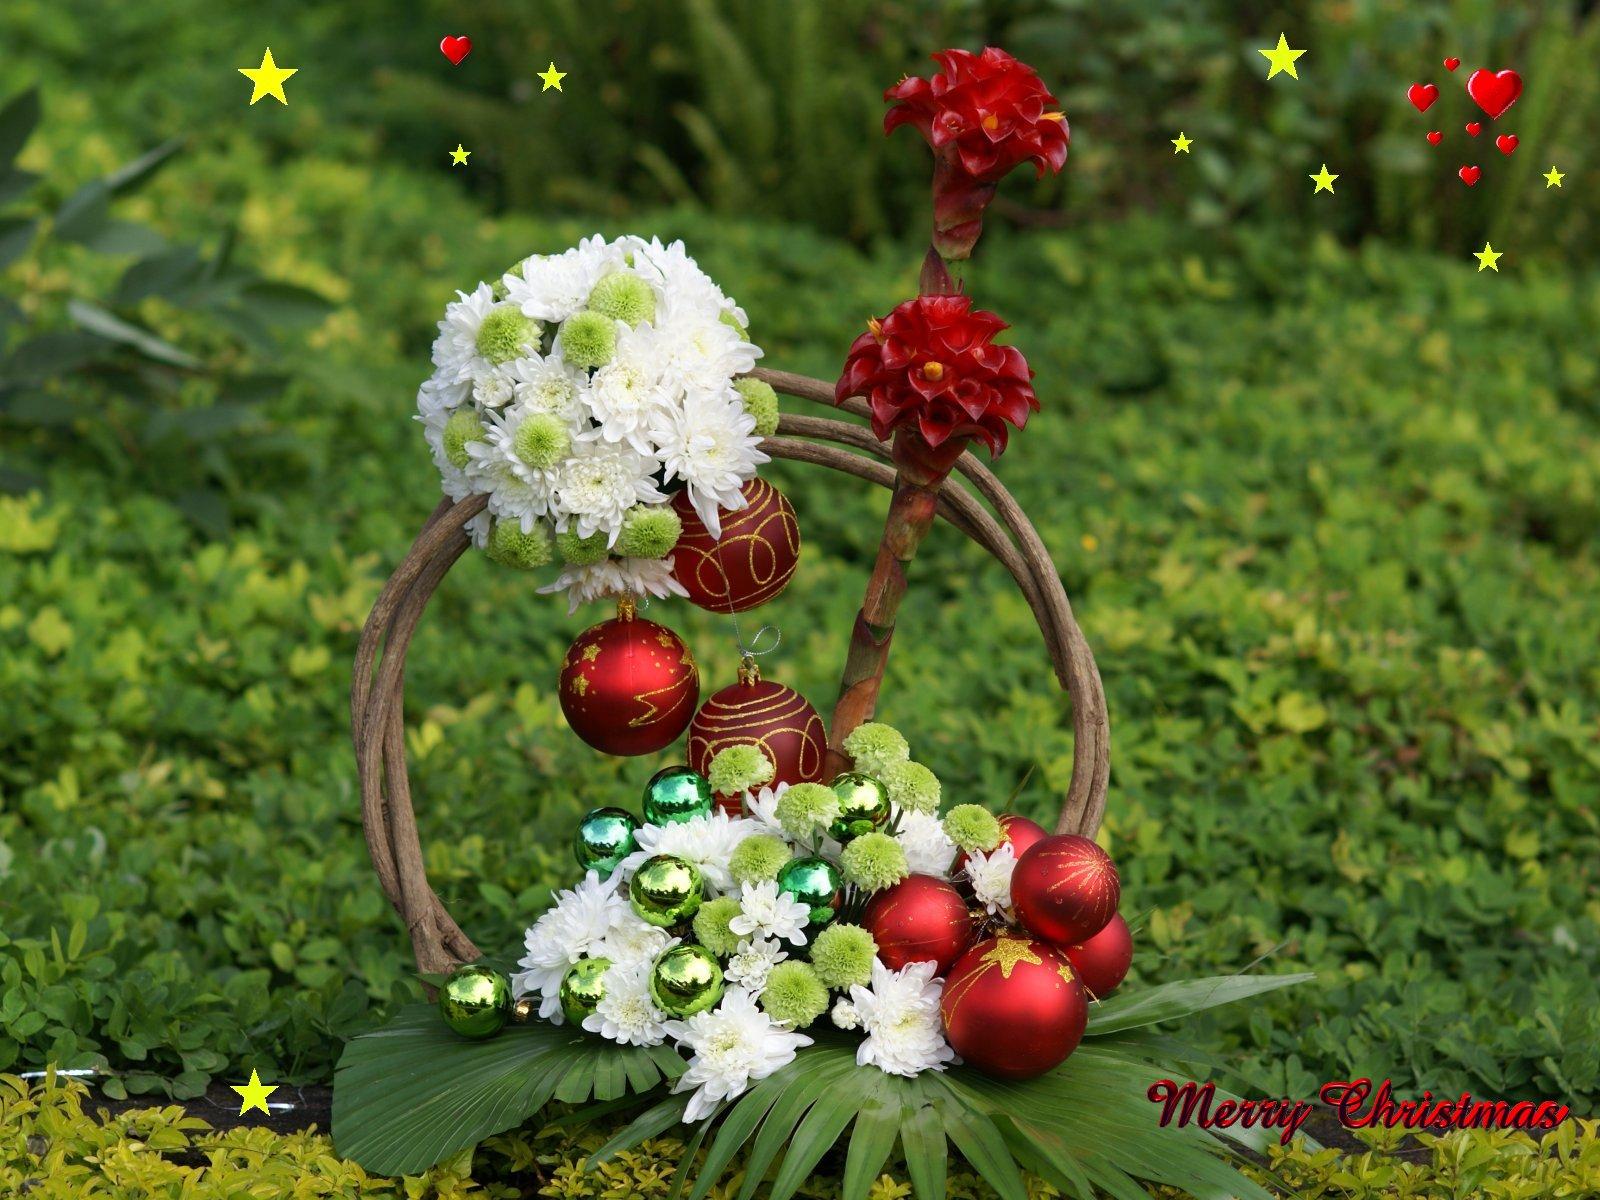 Christmas Flower Art Wp Dsc04704 A2 - Beauty Full Wall Paper , HD Wallpaper & Backgrounds